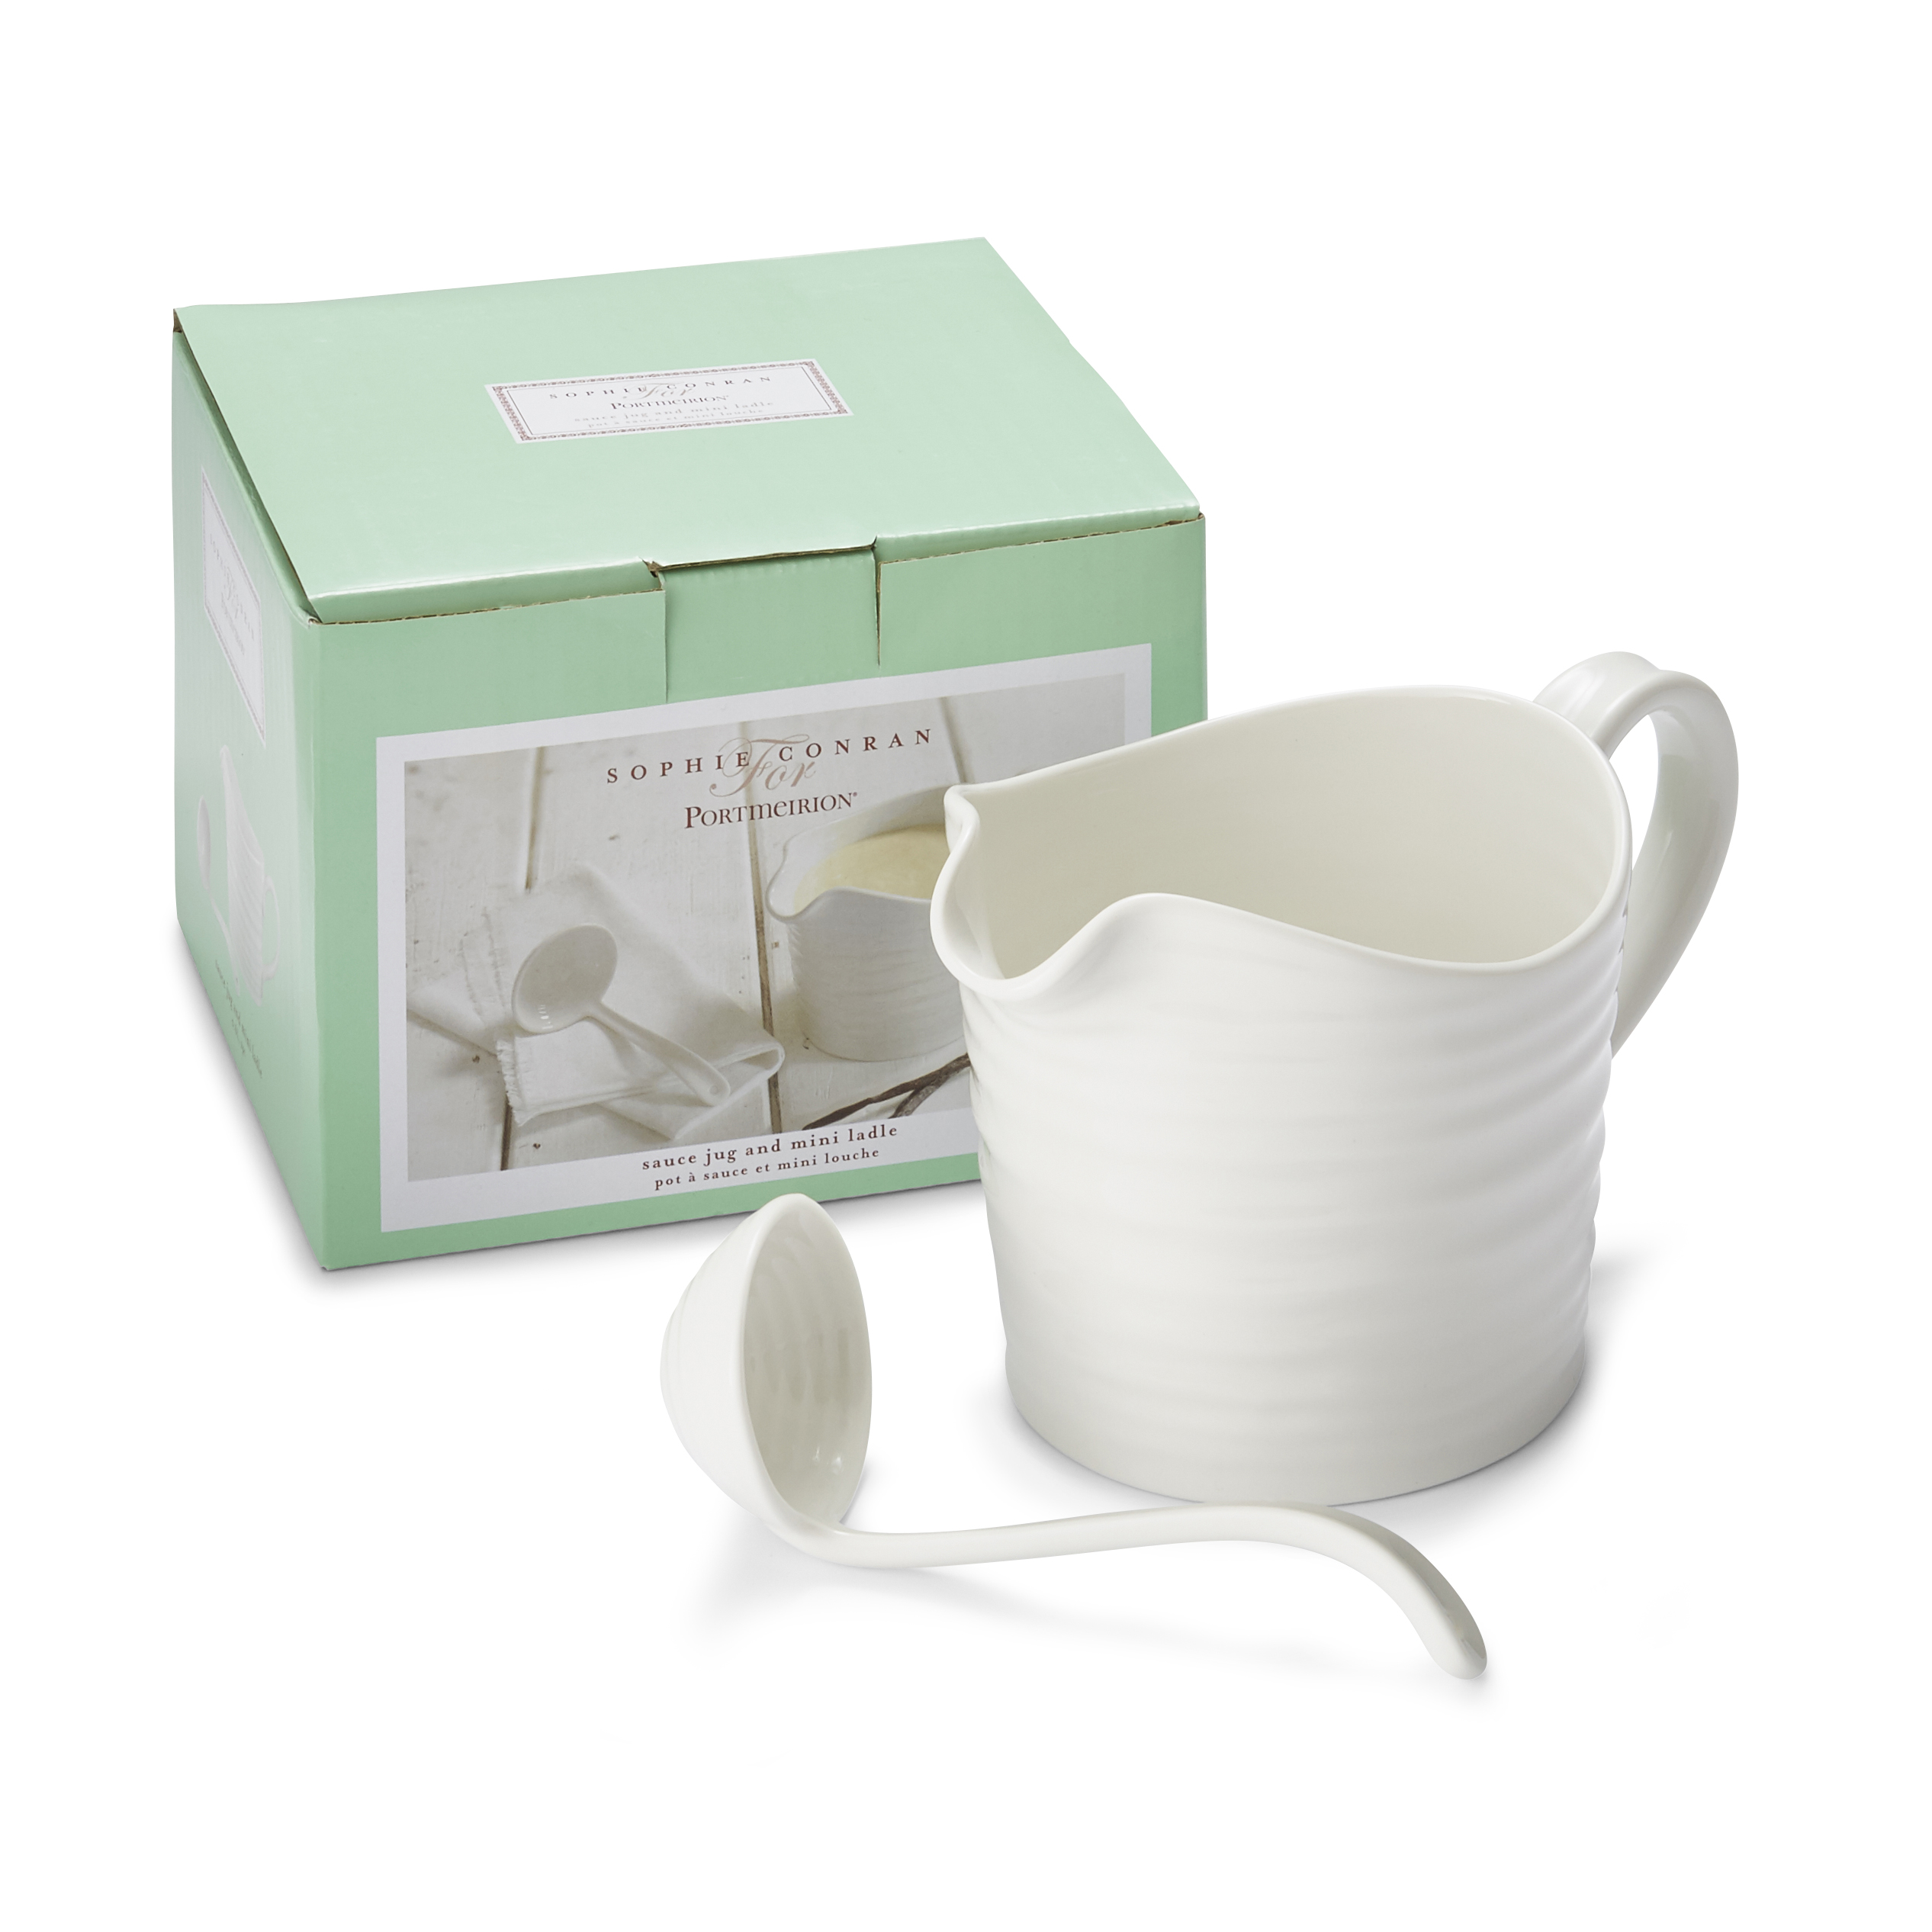 633094 Portmeirion Sophie Conran White Mini Sauce Jug and Ladle Set